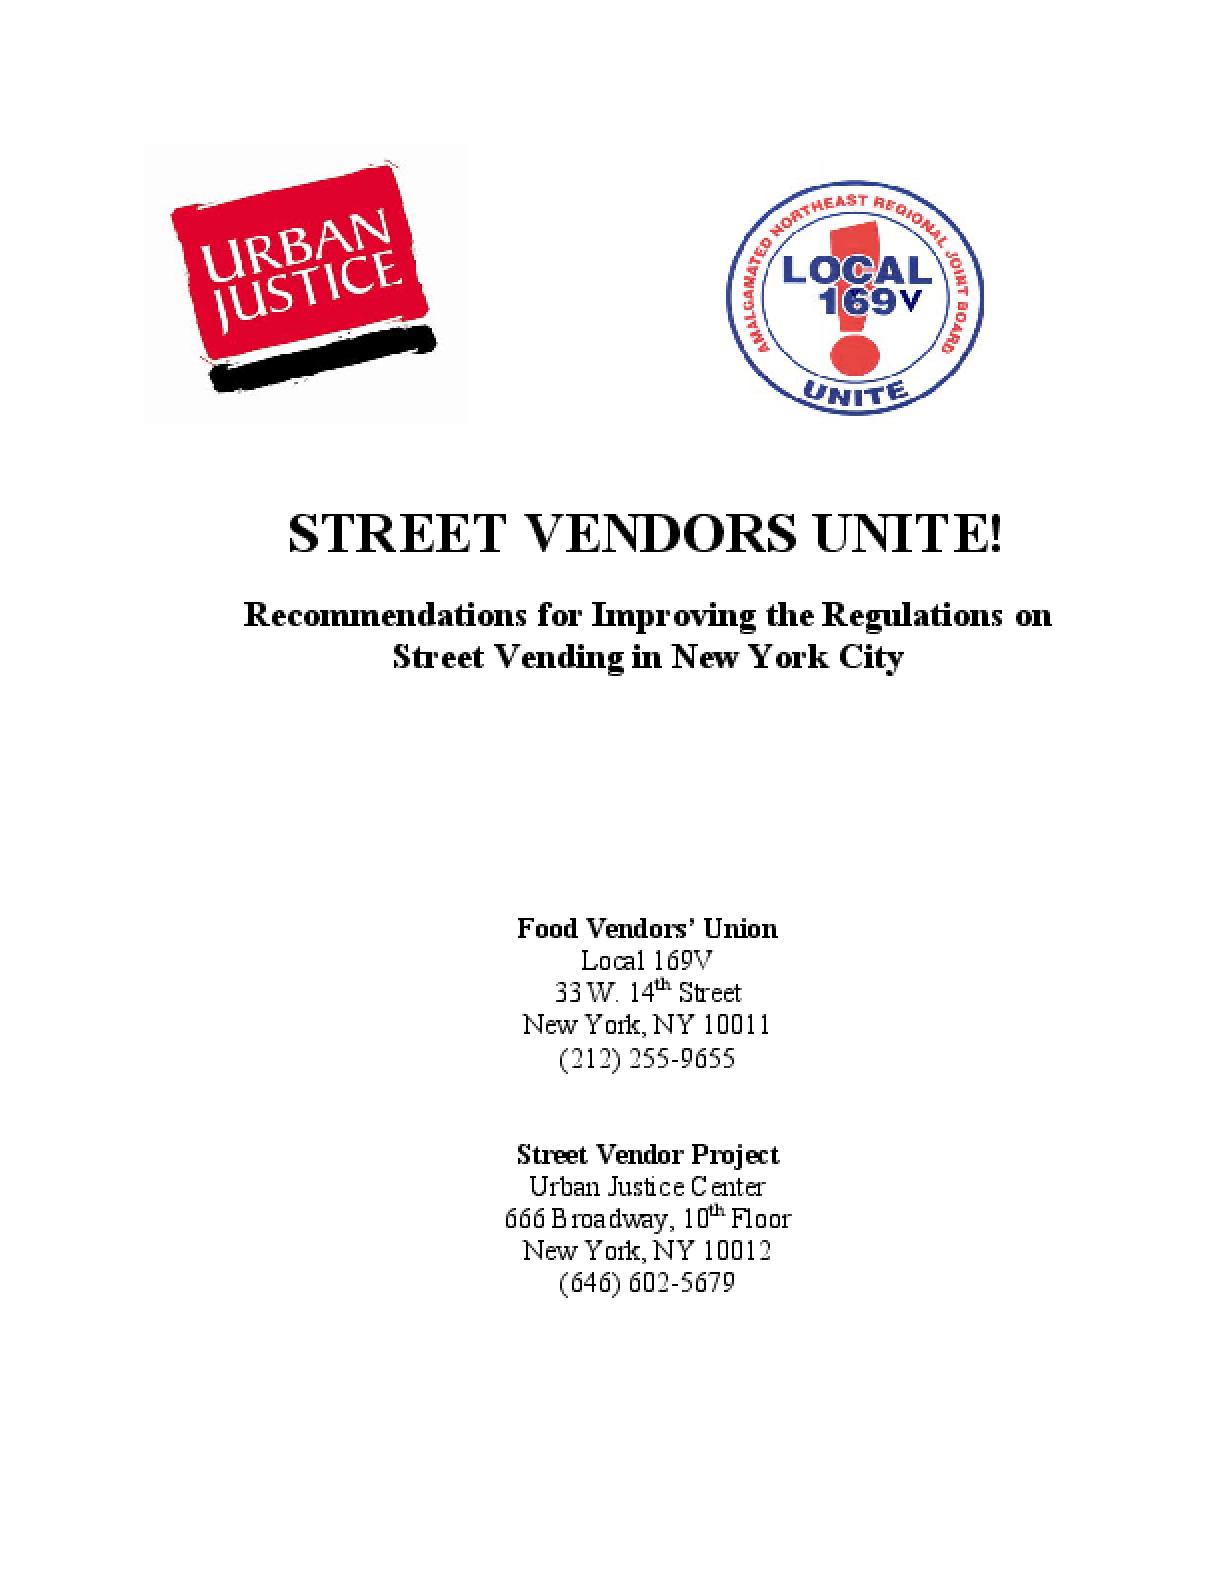 Street Vendors Unite! Recommendations for Improving the Regulations on Street Vending in New York City